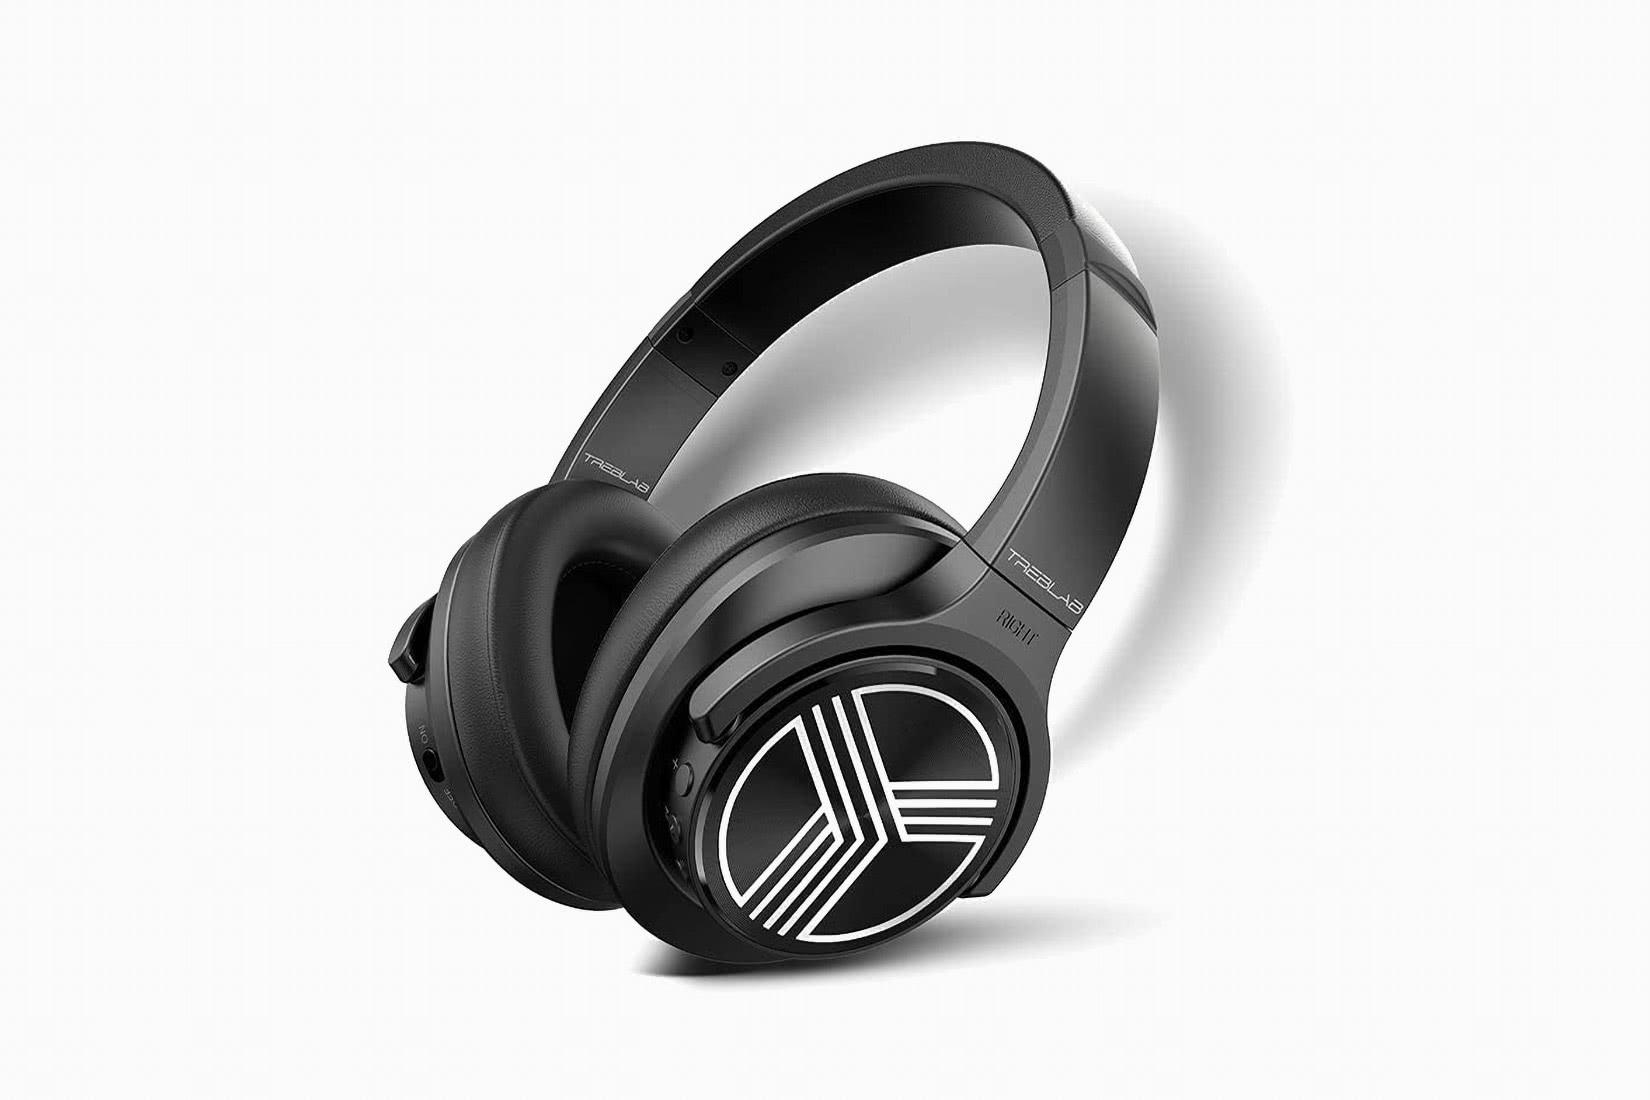 best over-ear headphones budget TREBLAB Z2 review - Luxe Digital